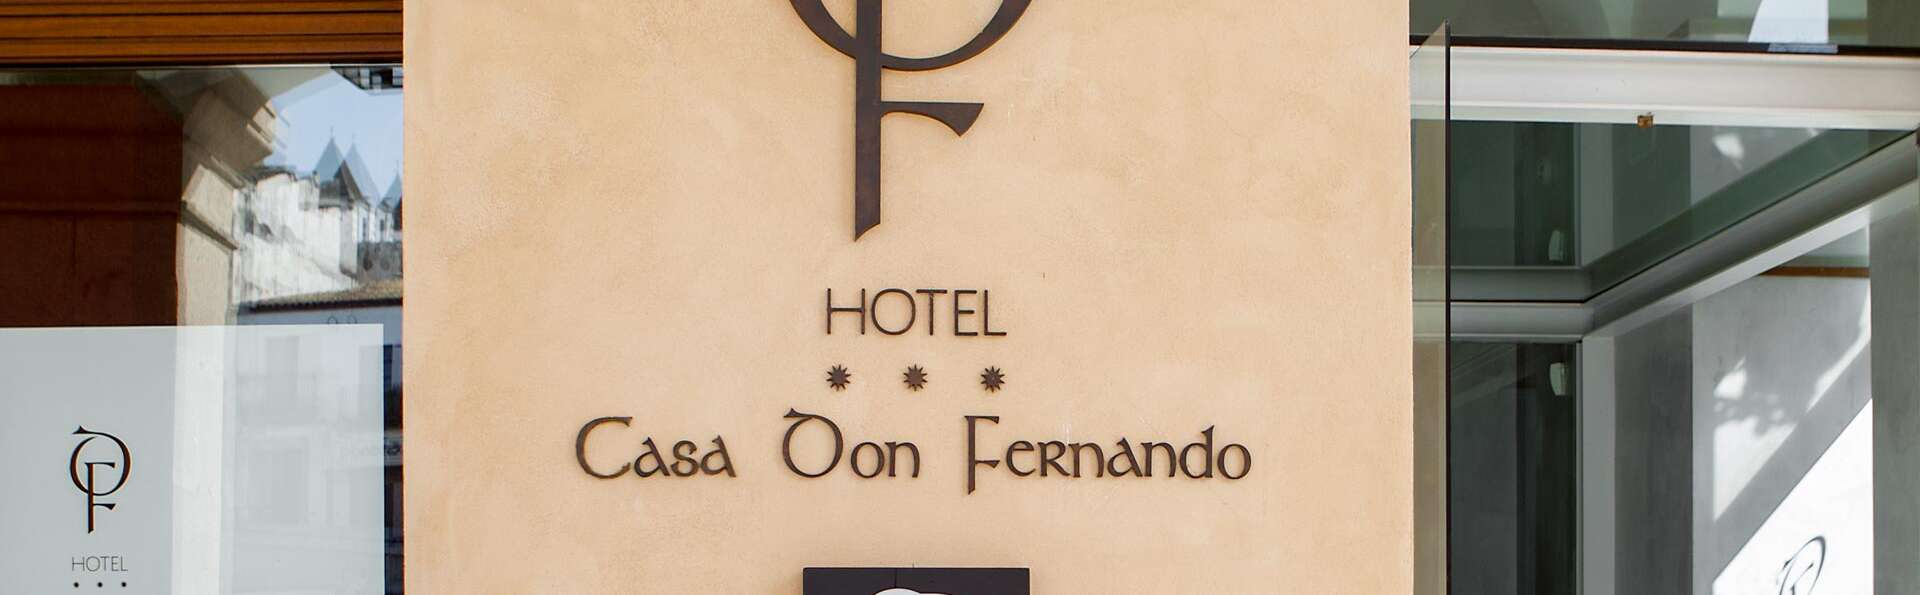 Hotel Soho Boutique Casa Don Fernando - EDIT_FRONT_02.jpg